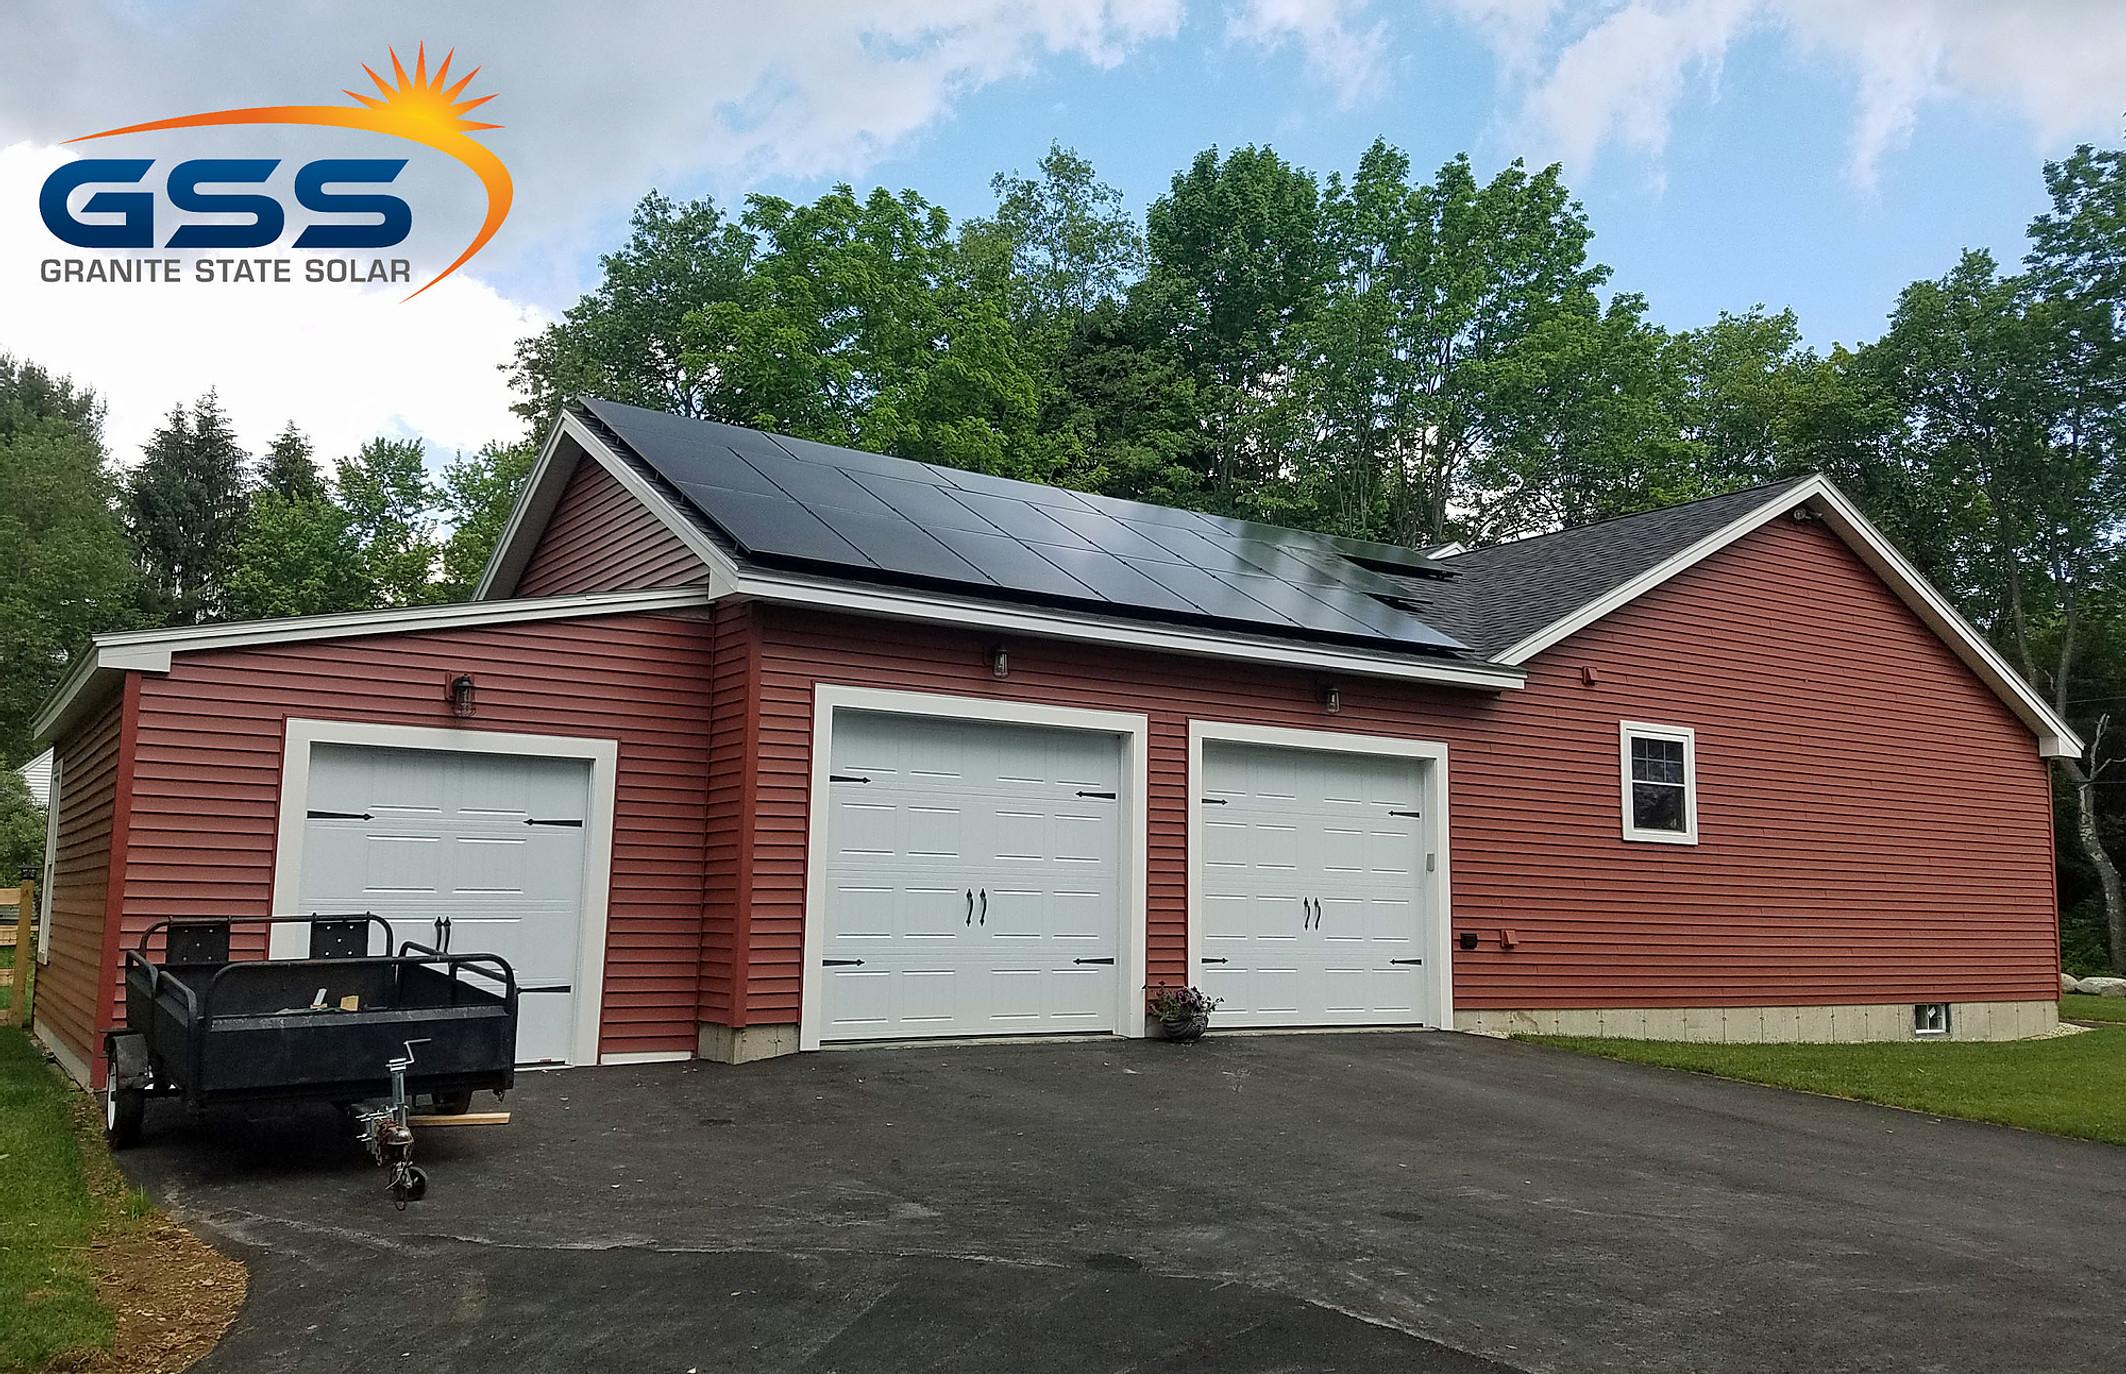 21 solar panel roof array